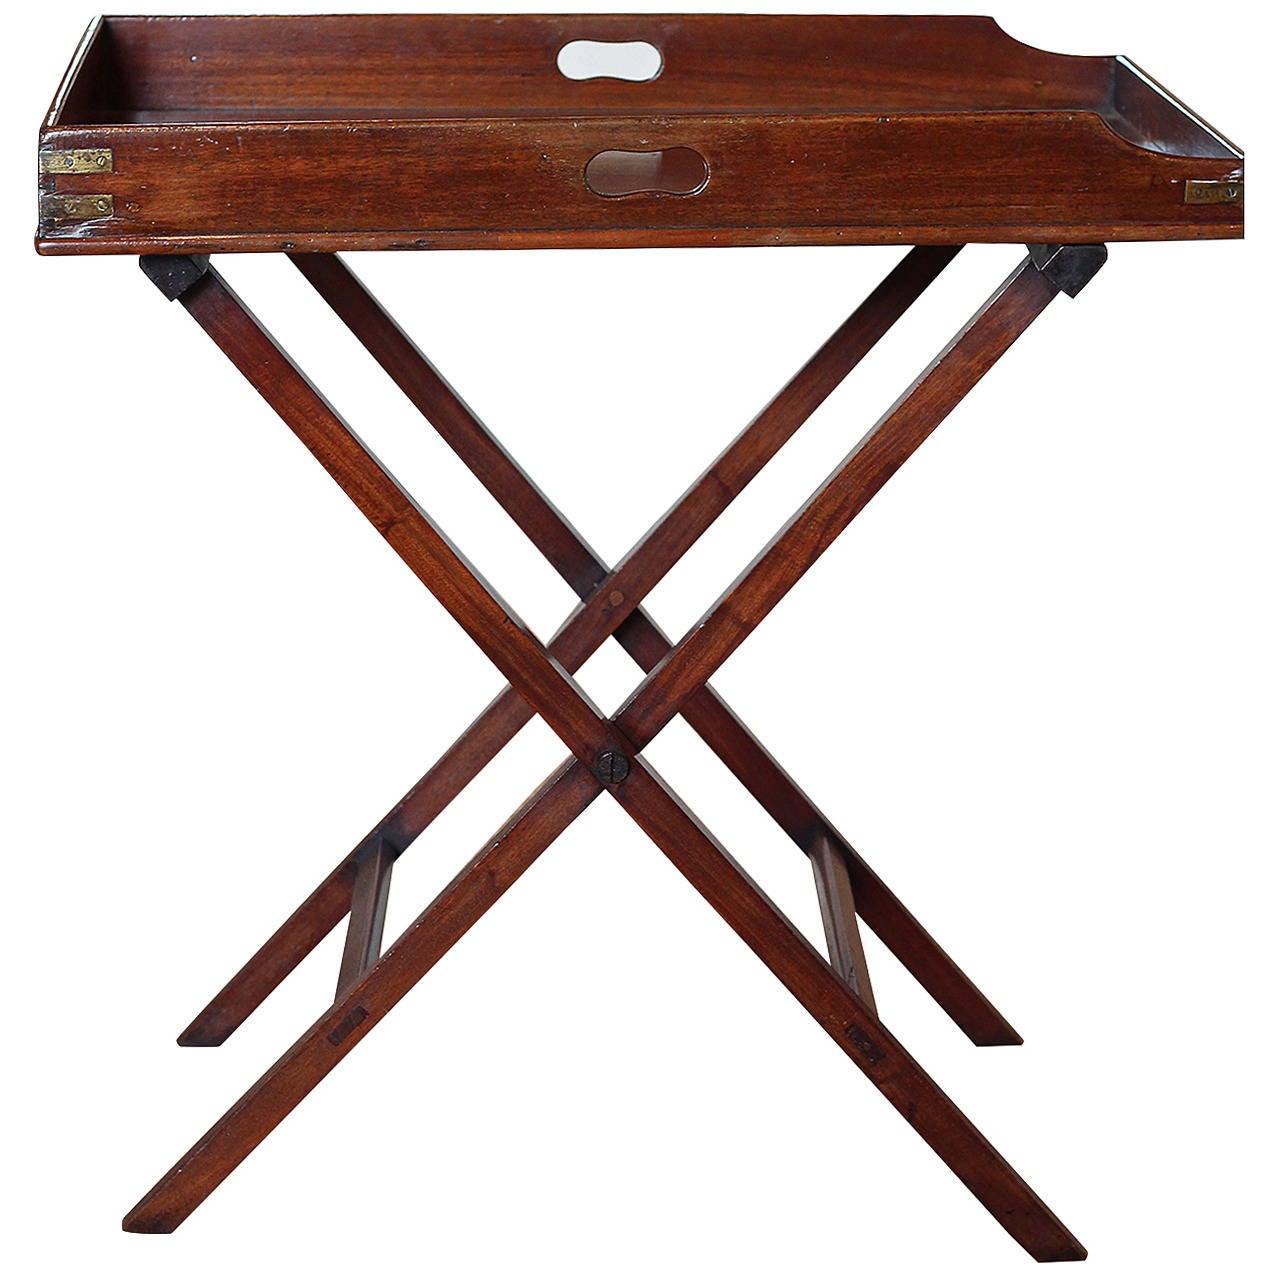 butler 39 s tray table at 1stdibs. Black Bedroom Furniture Sets. Home Design Ideas